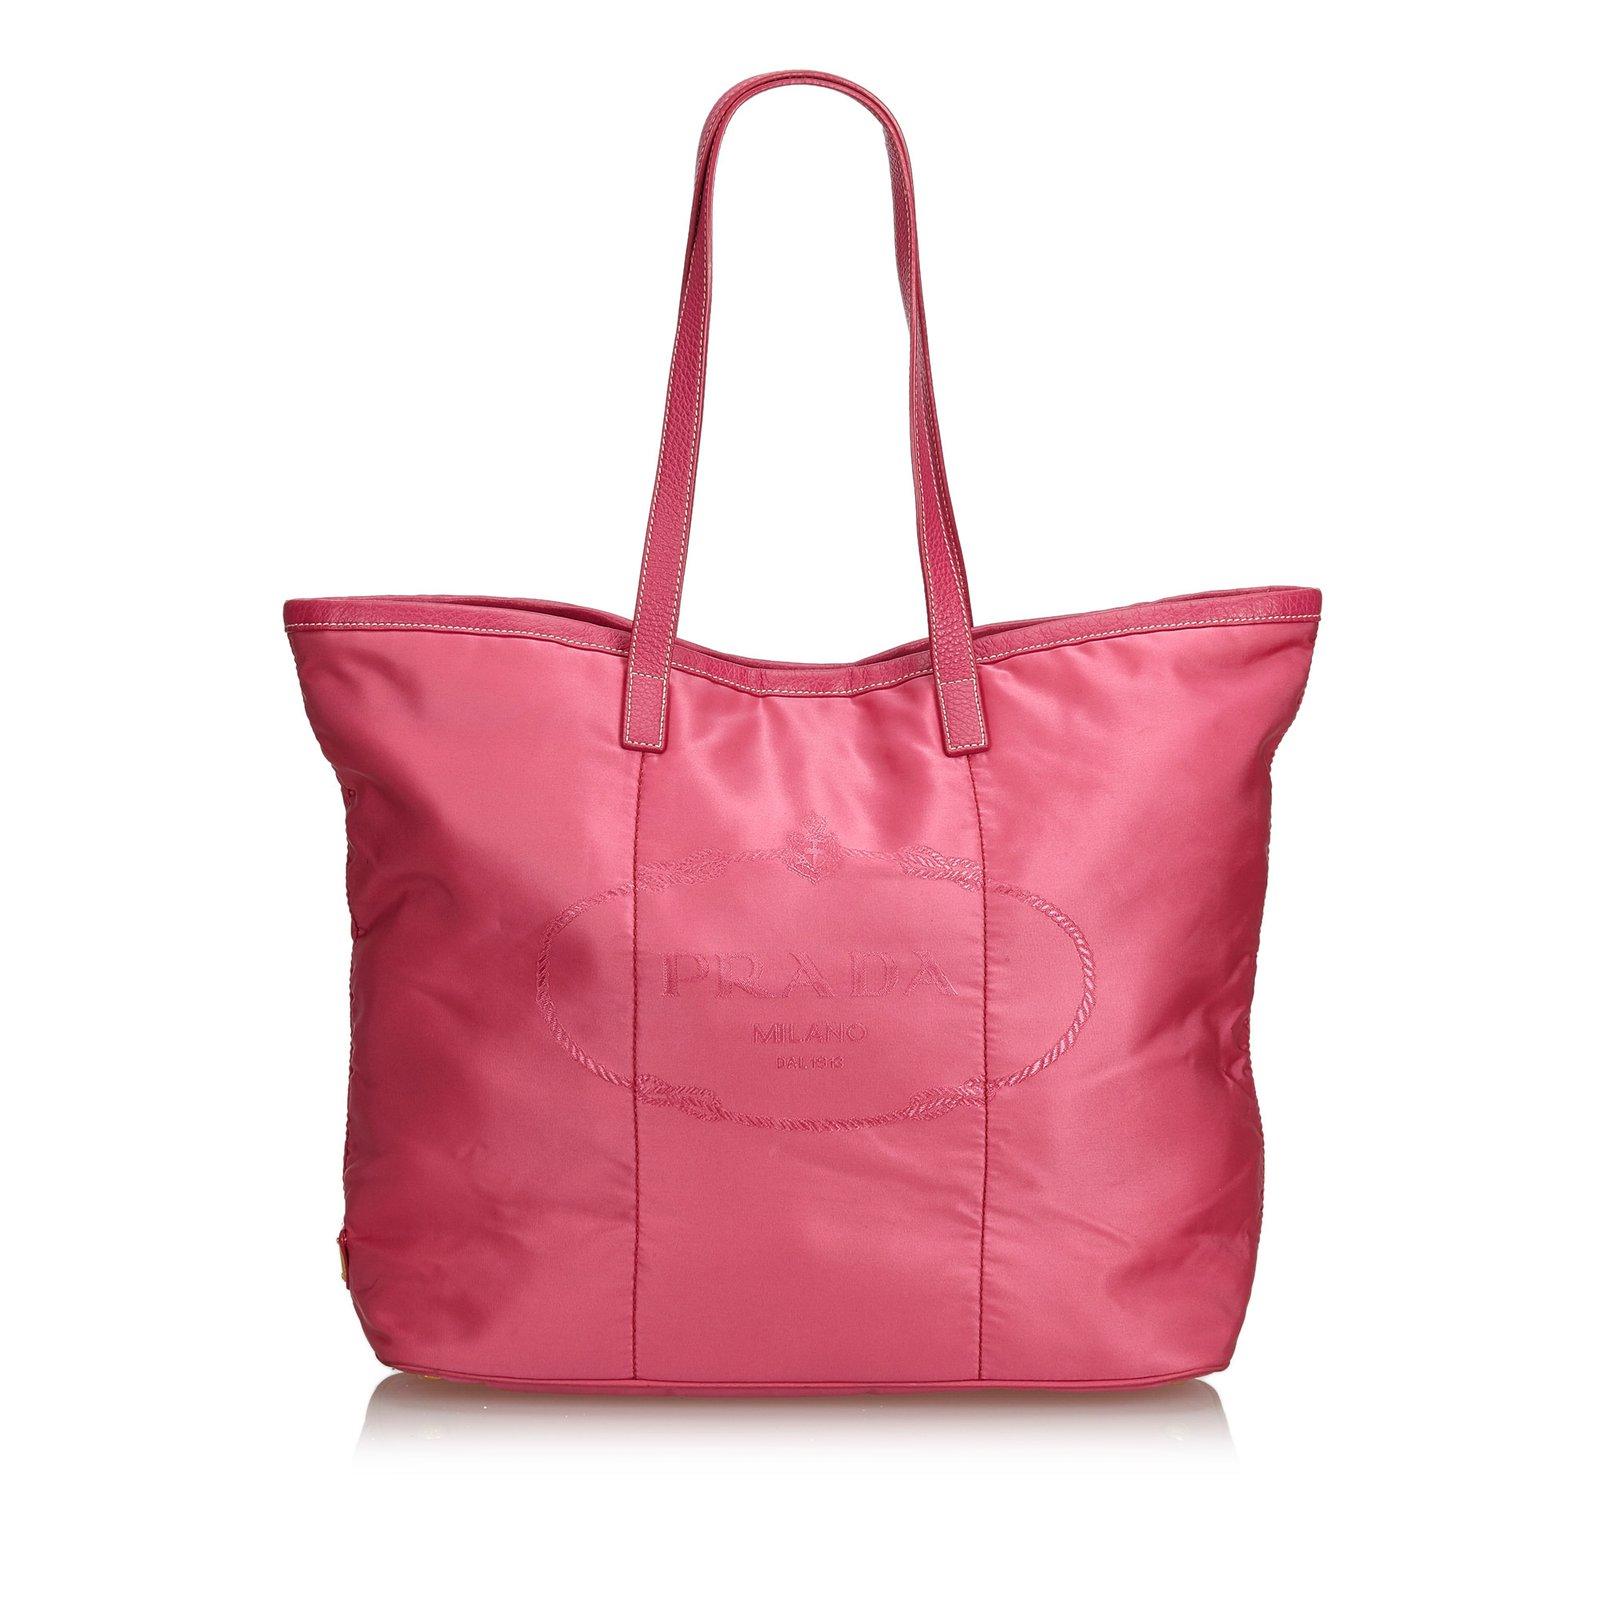 Cabas nylon Prada Sac Cuir autre Logo tissu Nylon Rose Avec En 1a8qnR1P